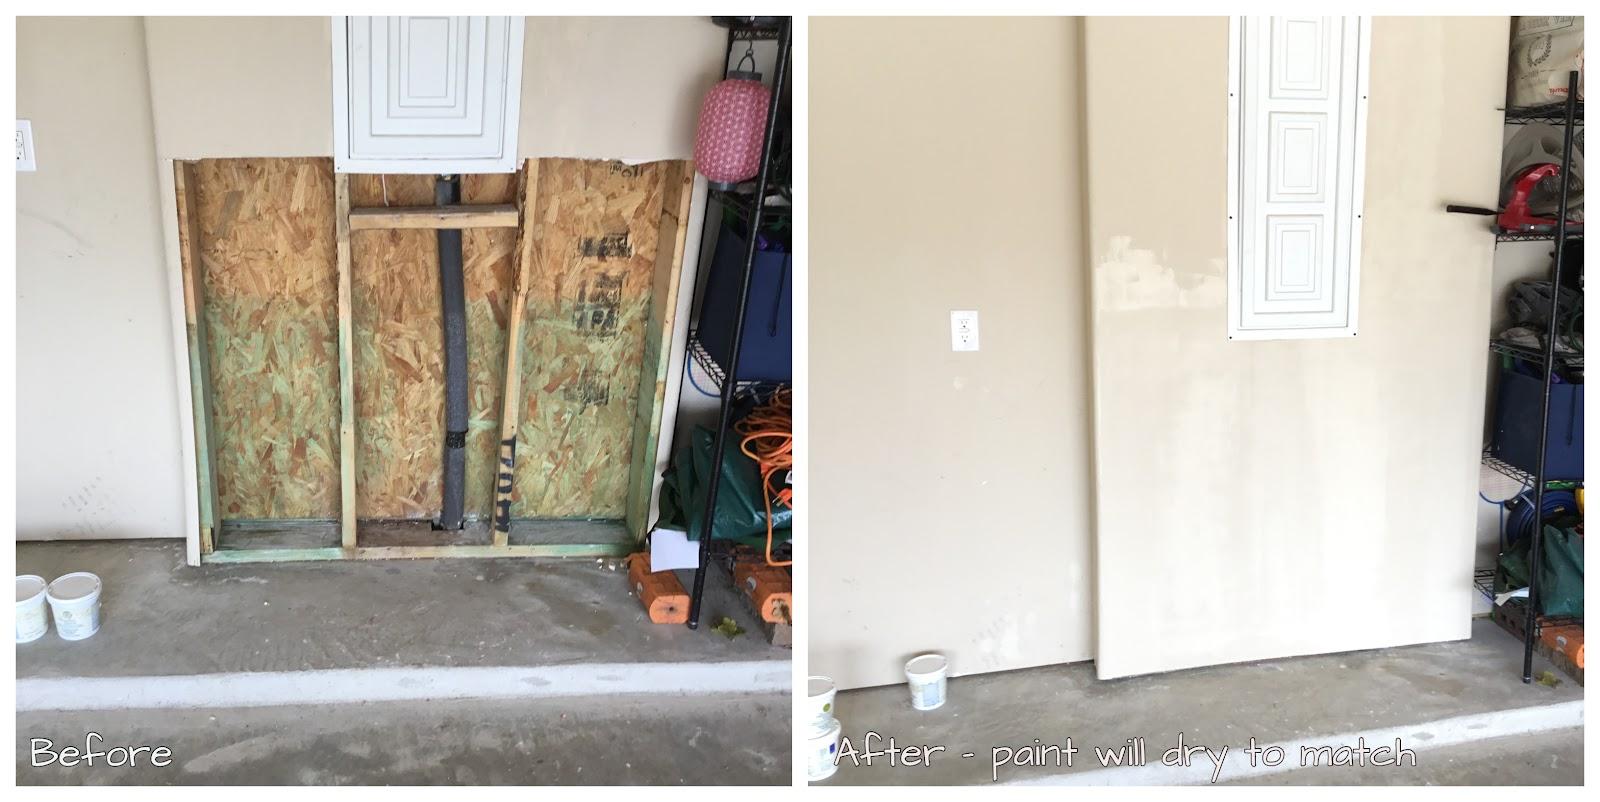 Handyman Melissa drywall repair